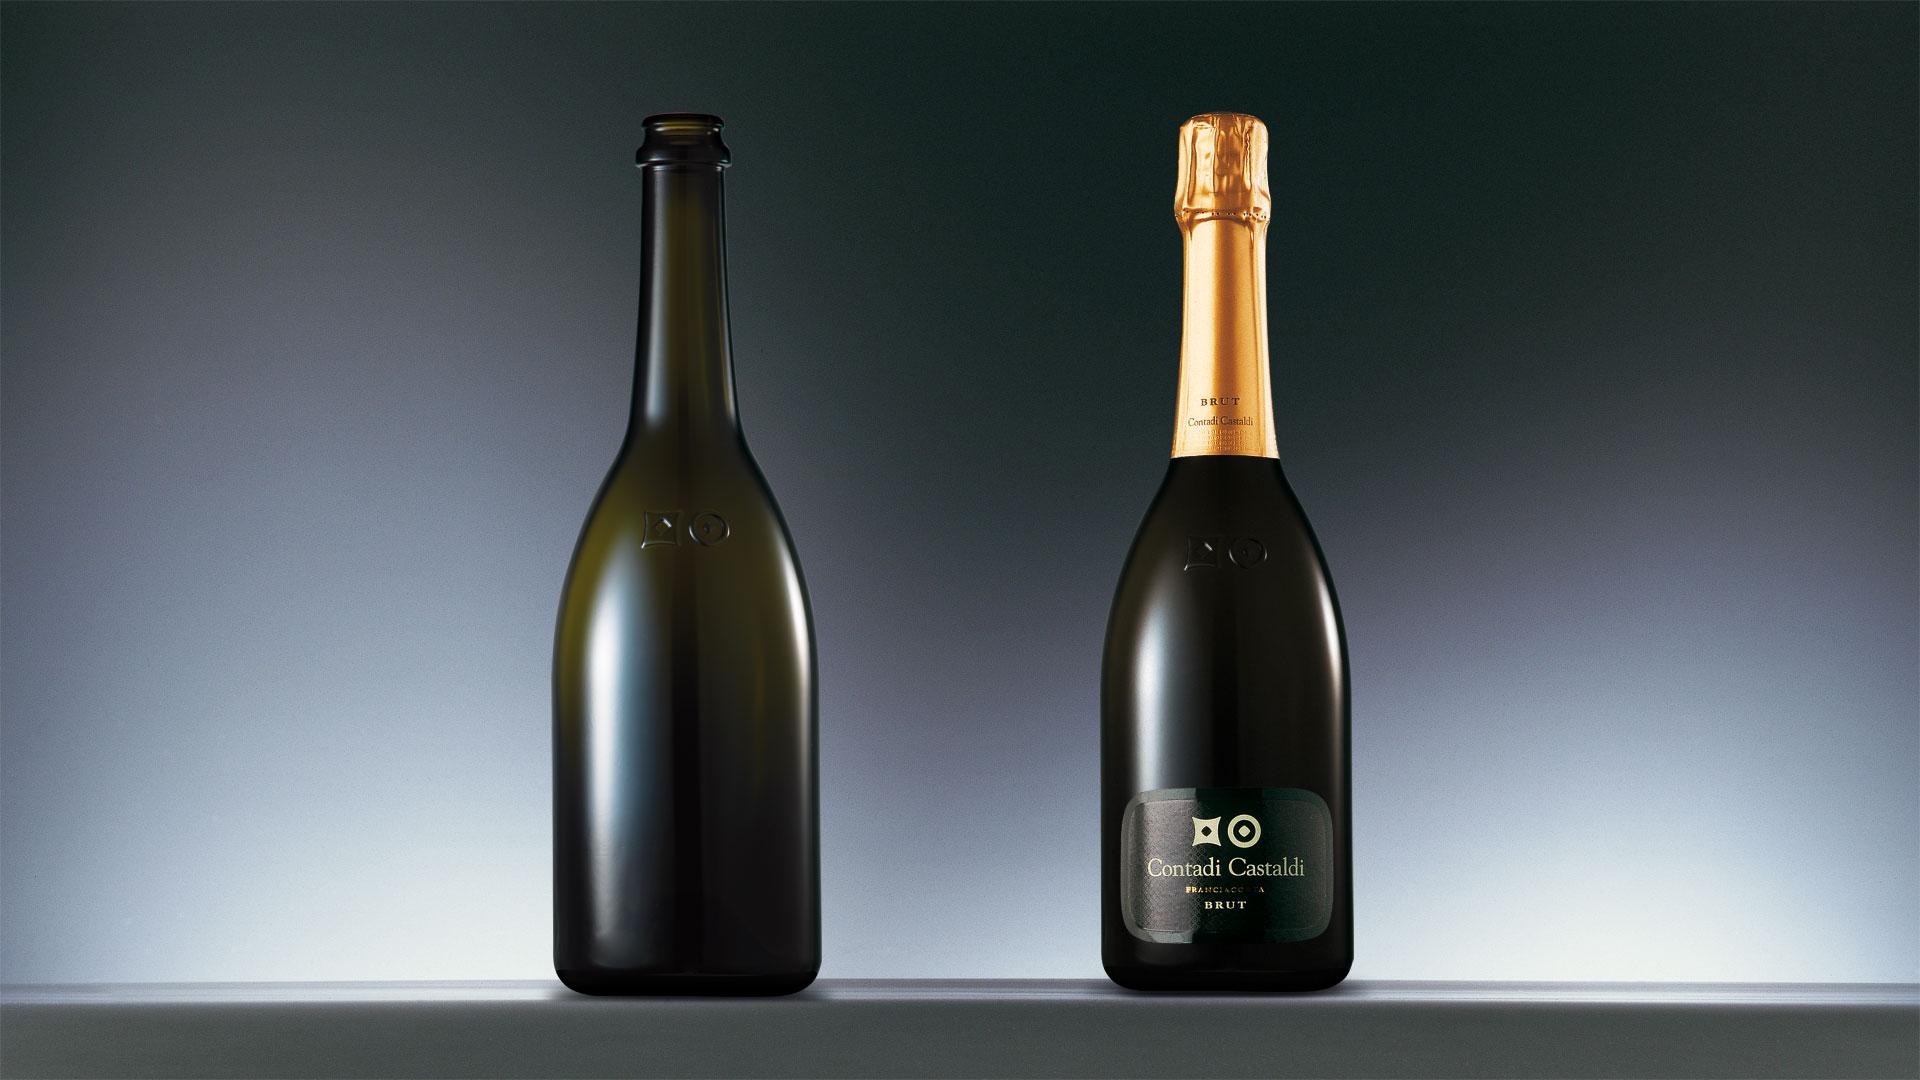 Terra Moretti Contadi Castaldi brut bottle design